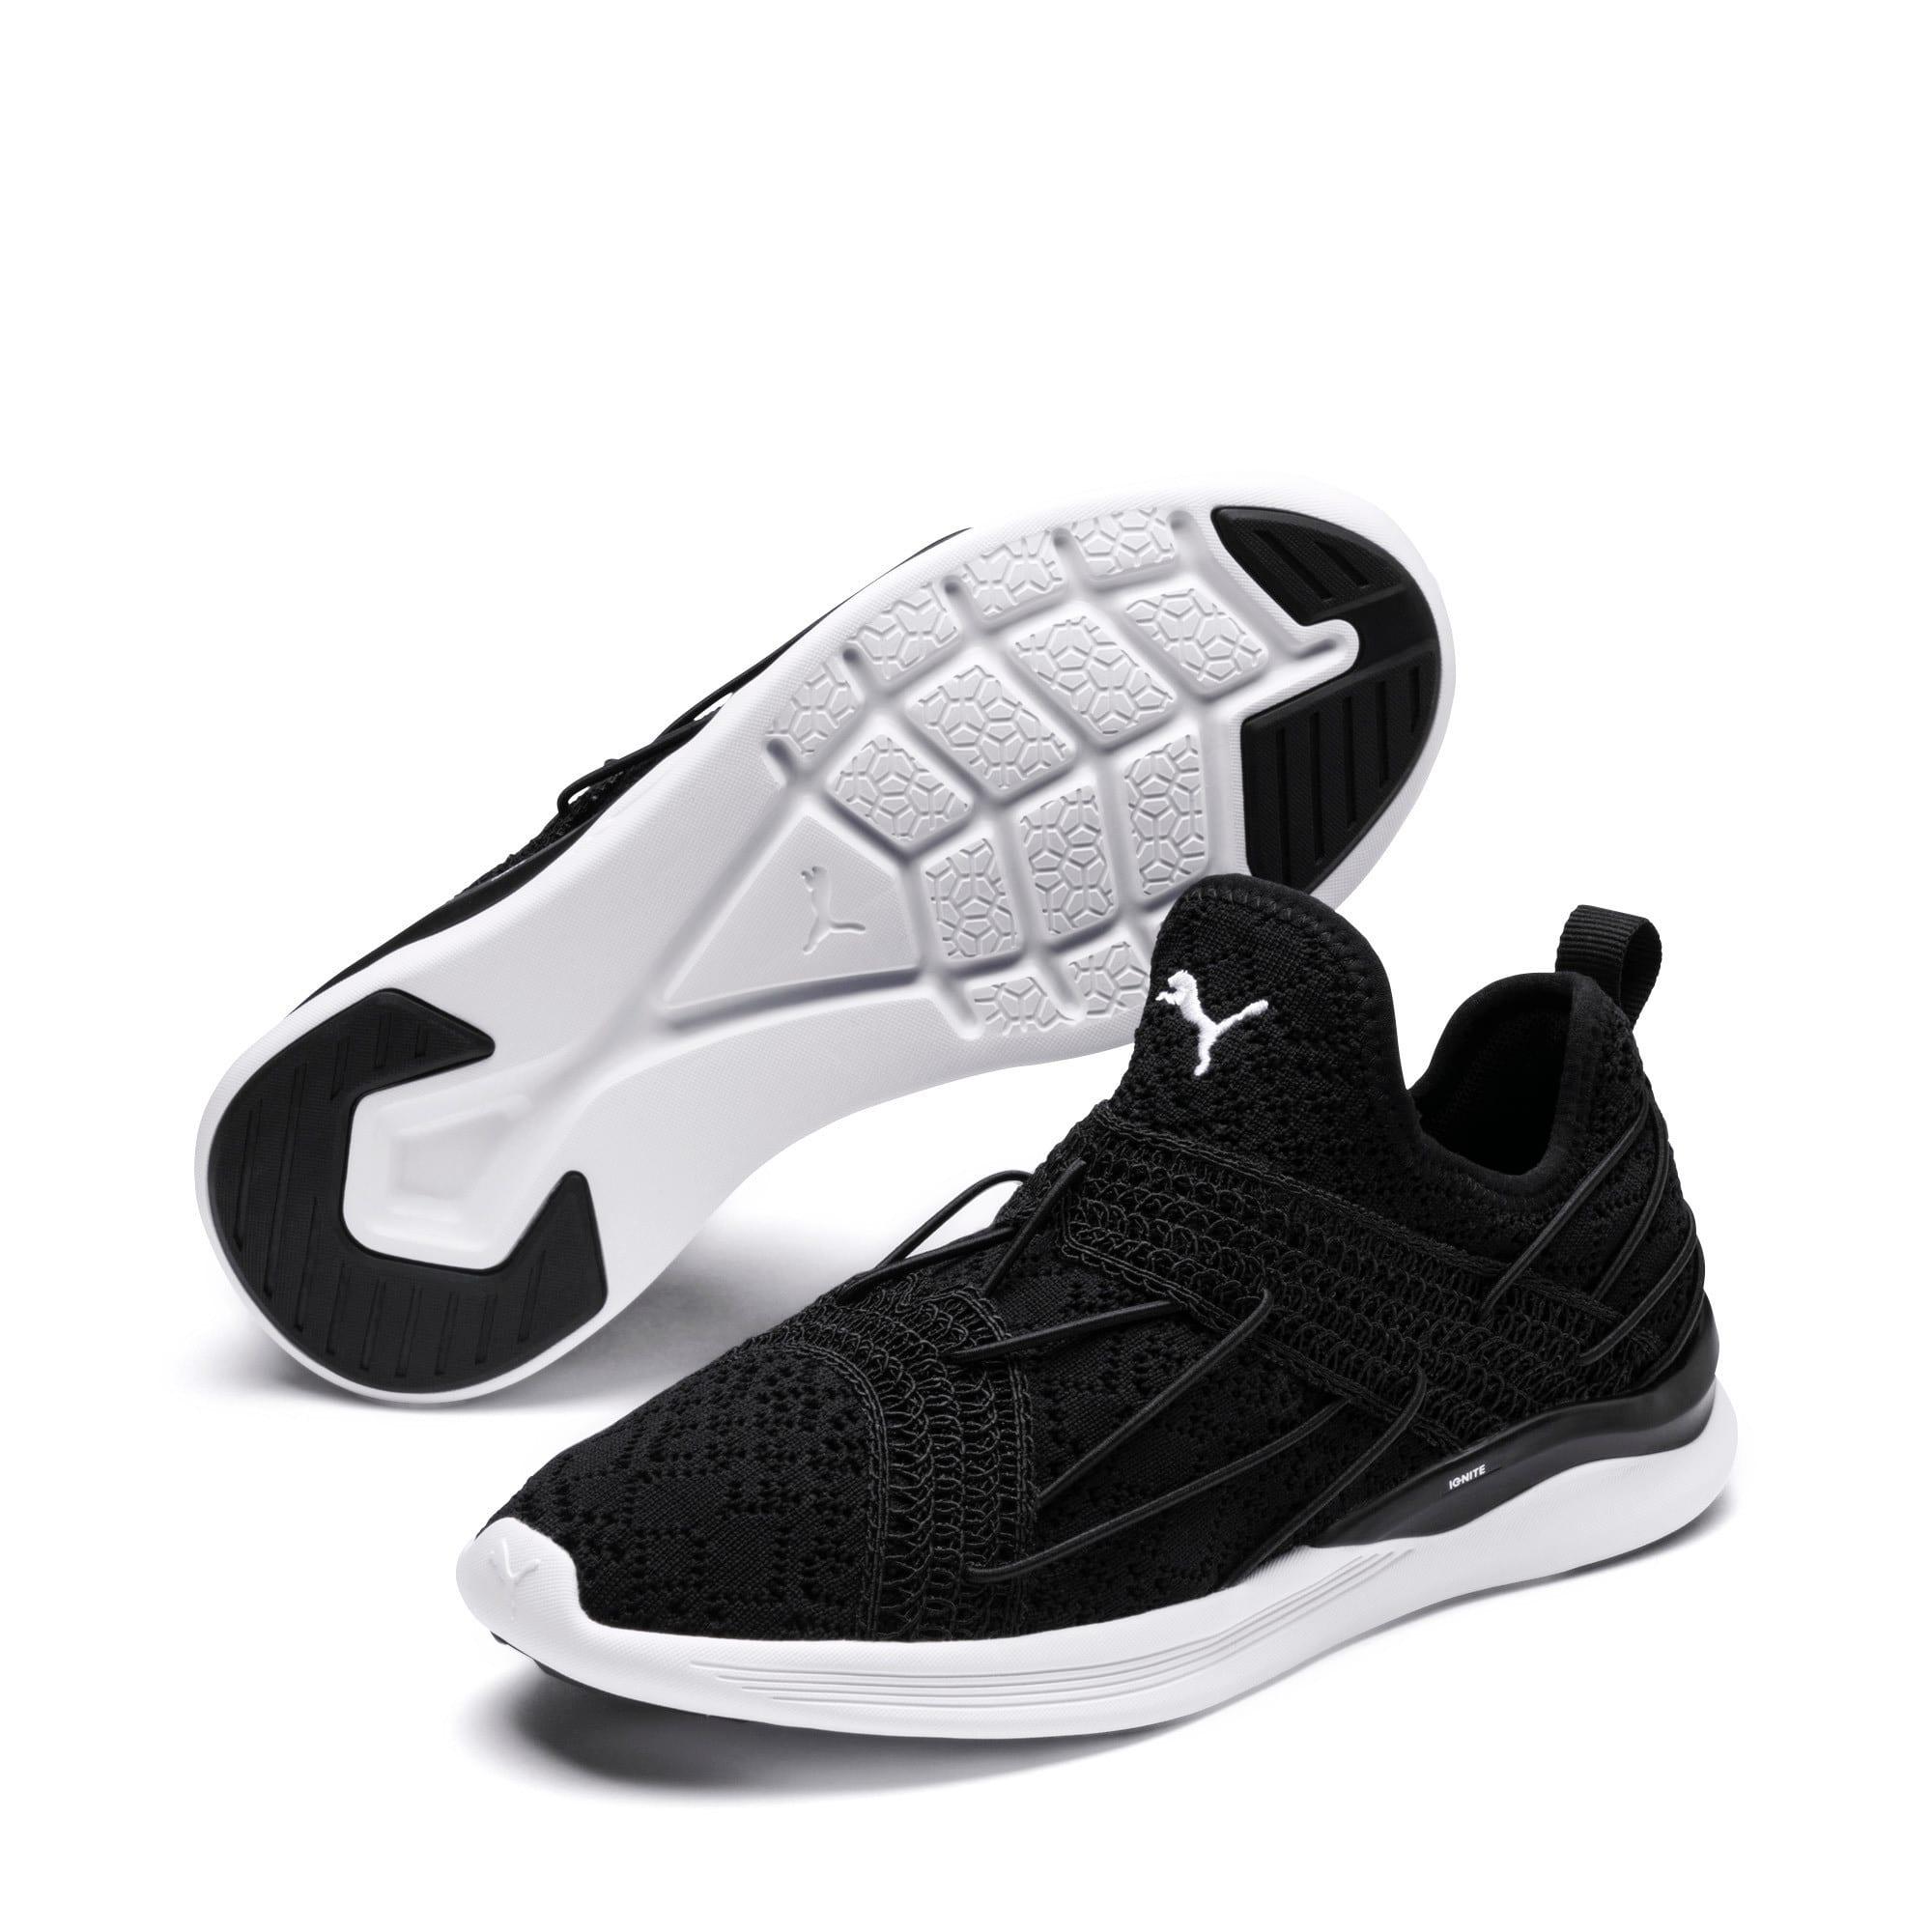 Thumbnail 2 of IGNITE Flash Sensua Women's Running Shoes, Puma Black-Puma White, medium